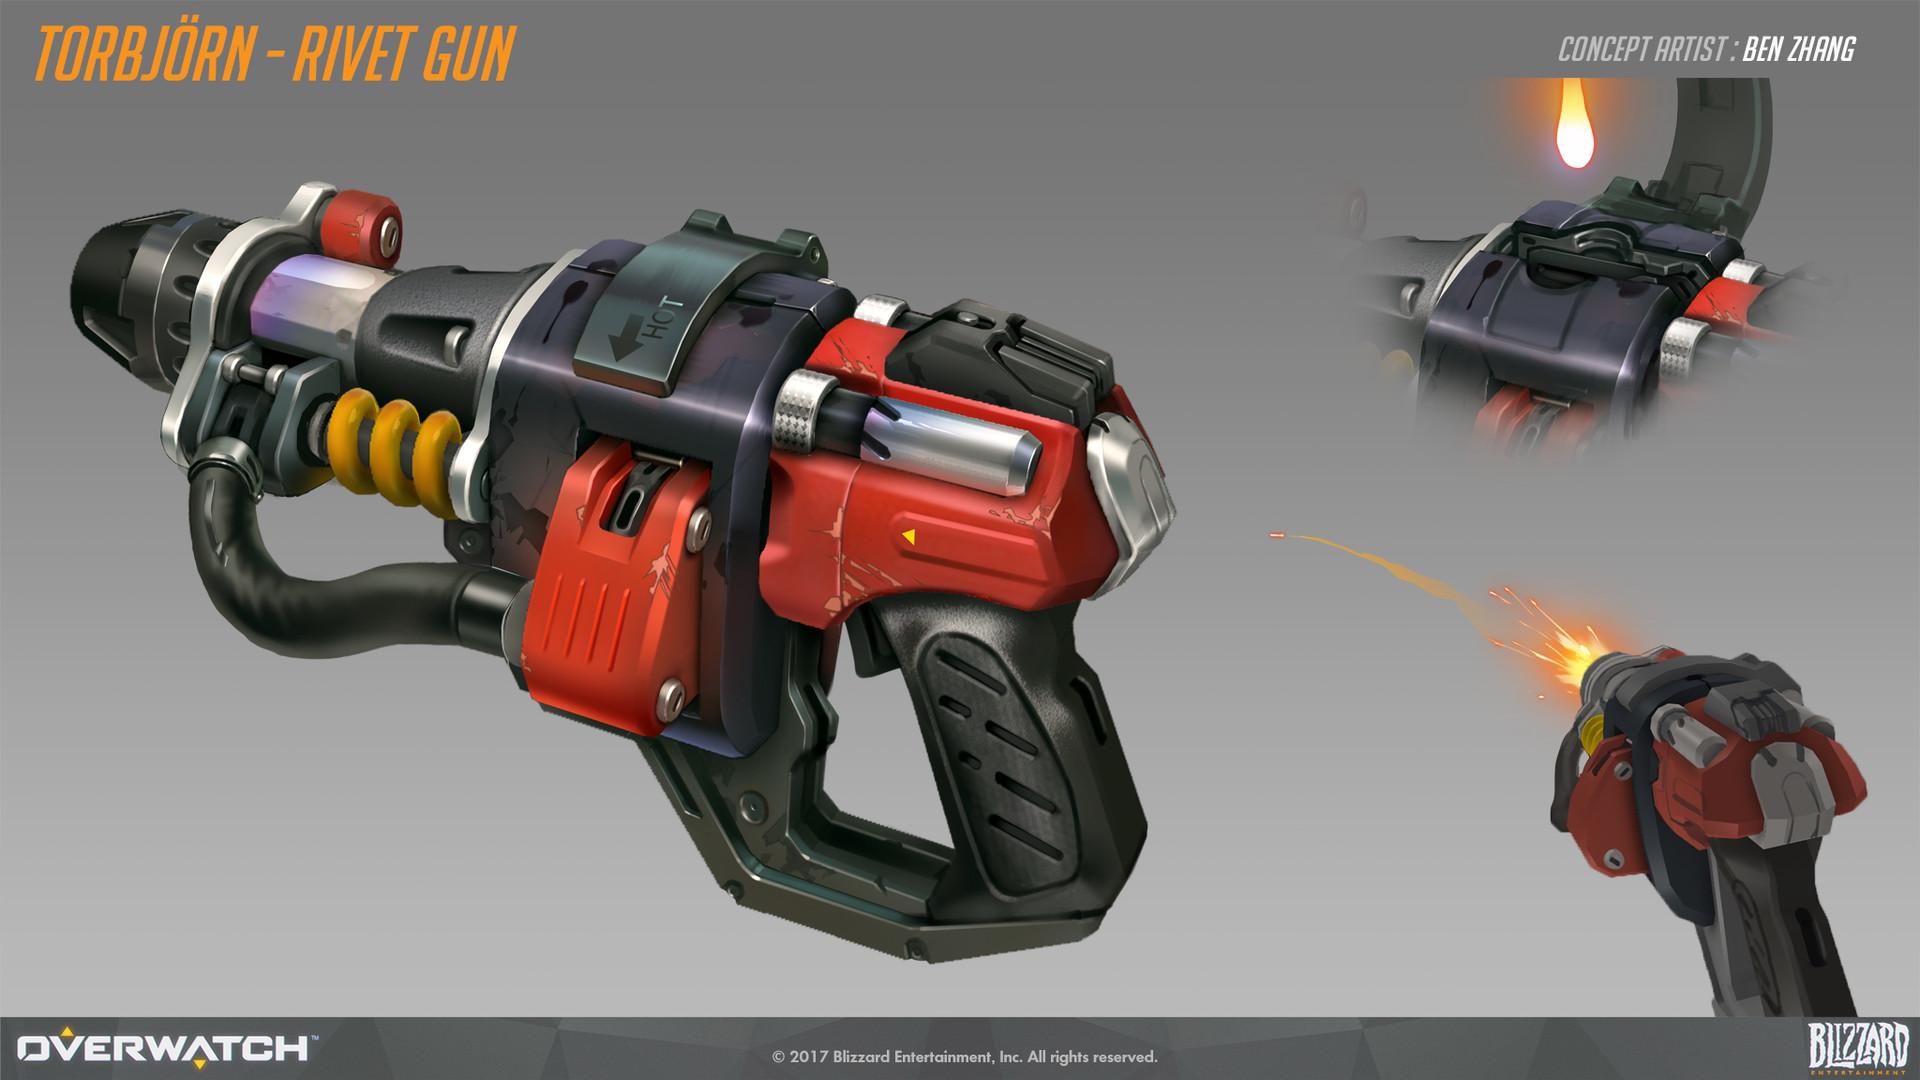 Ben zhang rivet gun concept